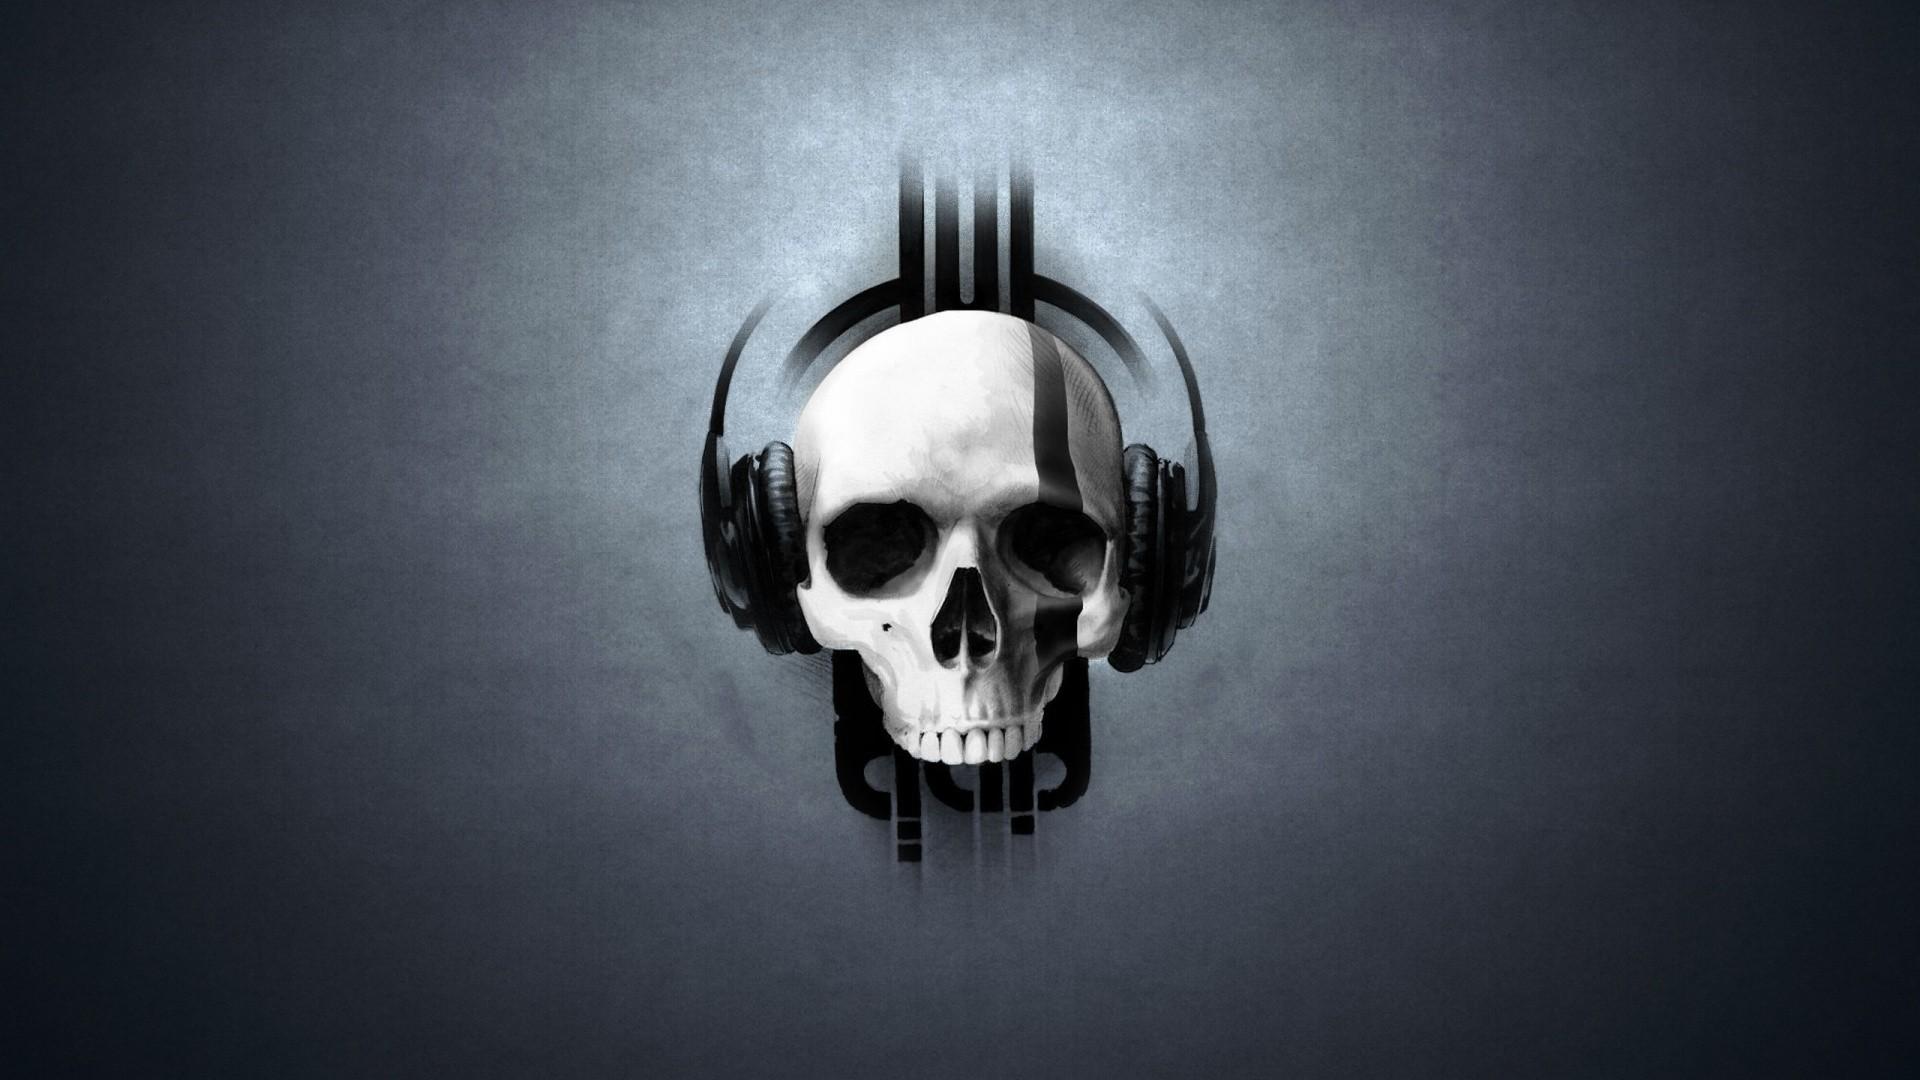 Cool Dark hd wallpaper download